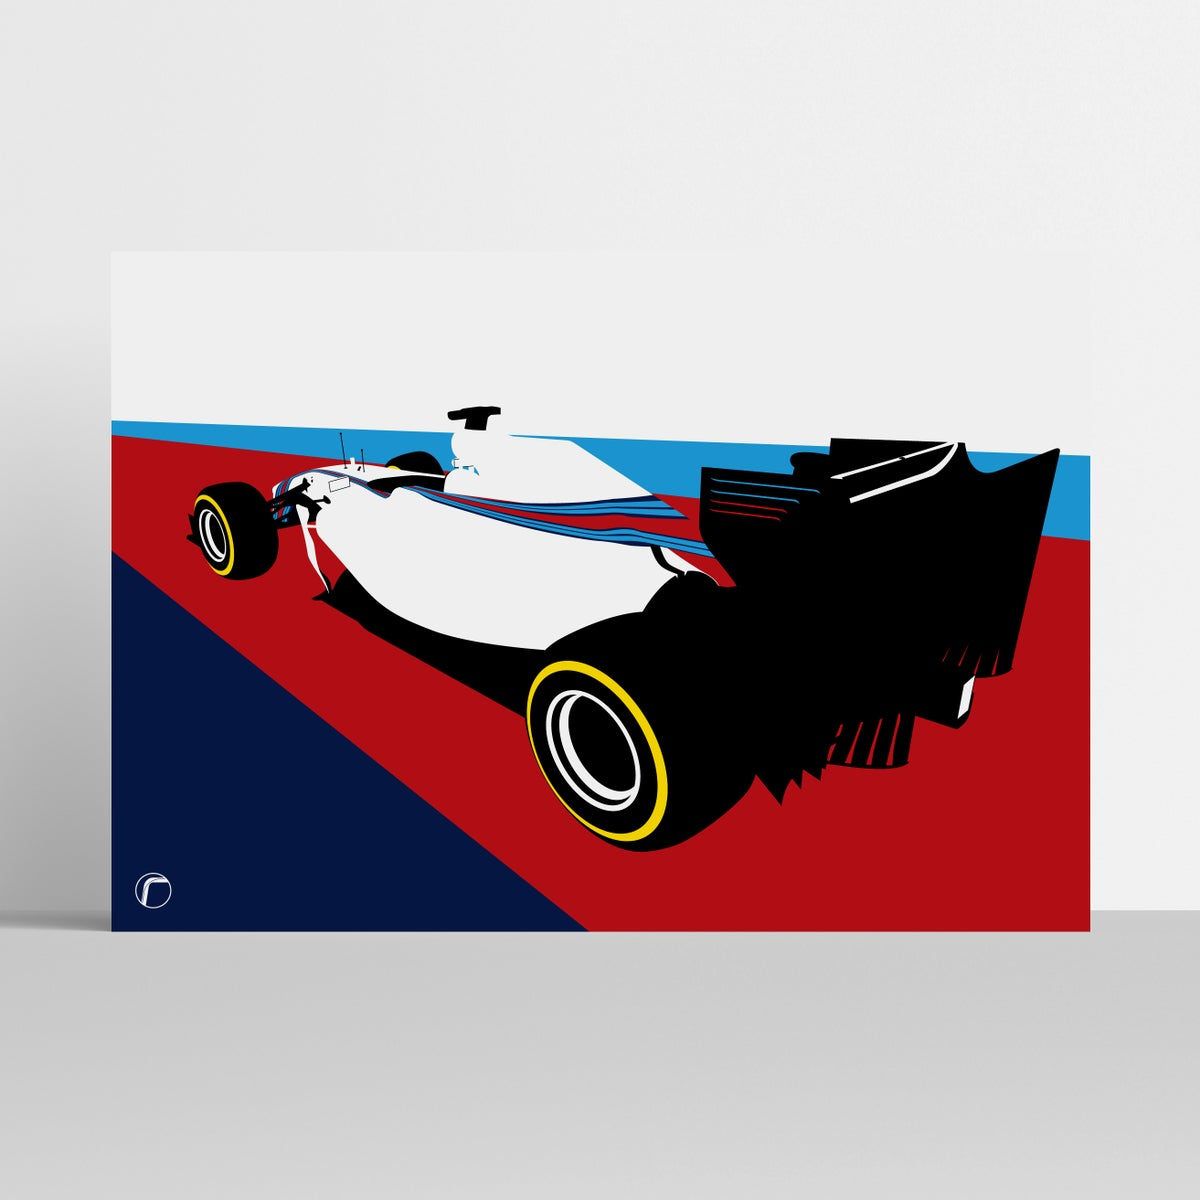 Image of Williams FW36